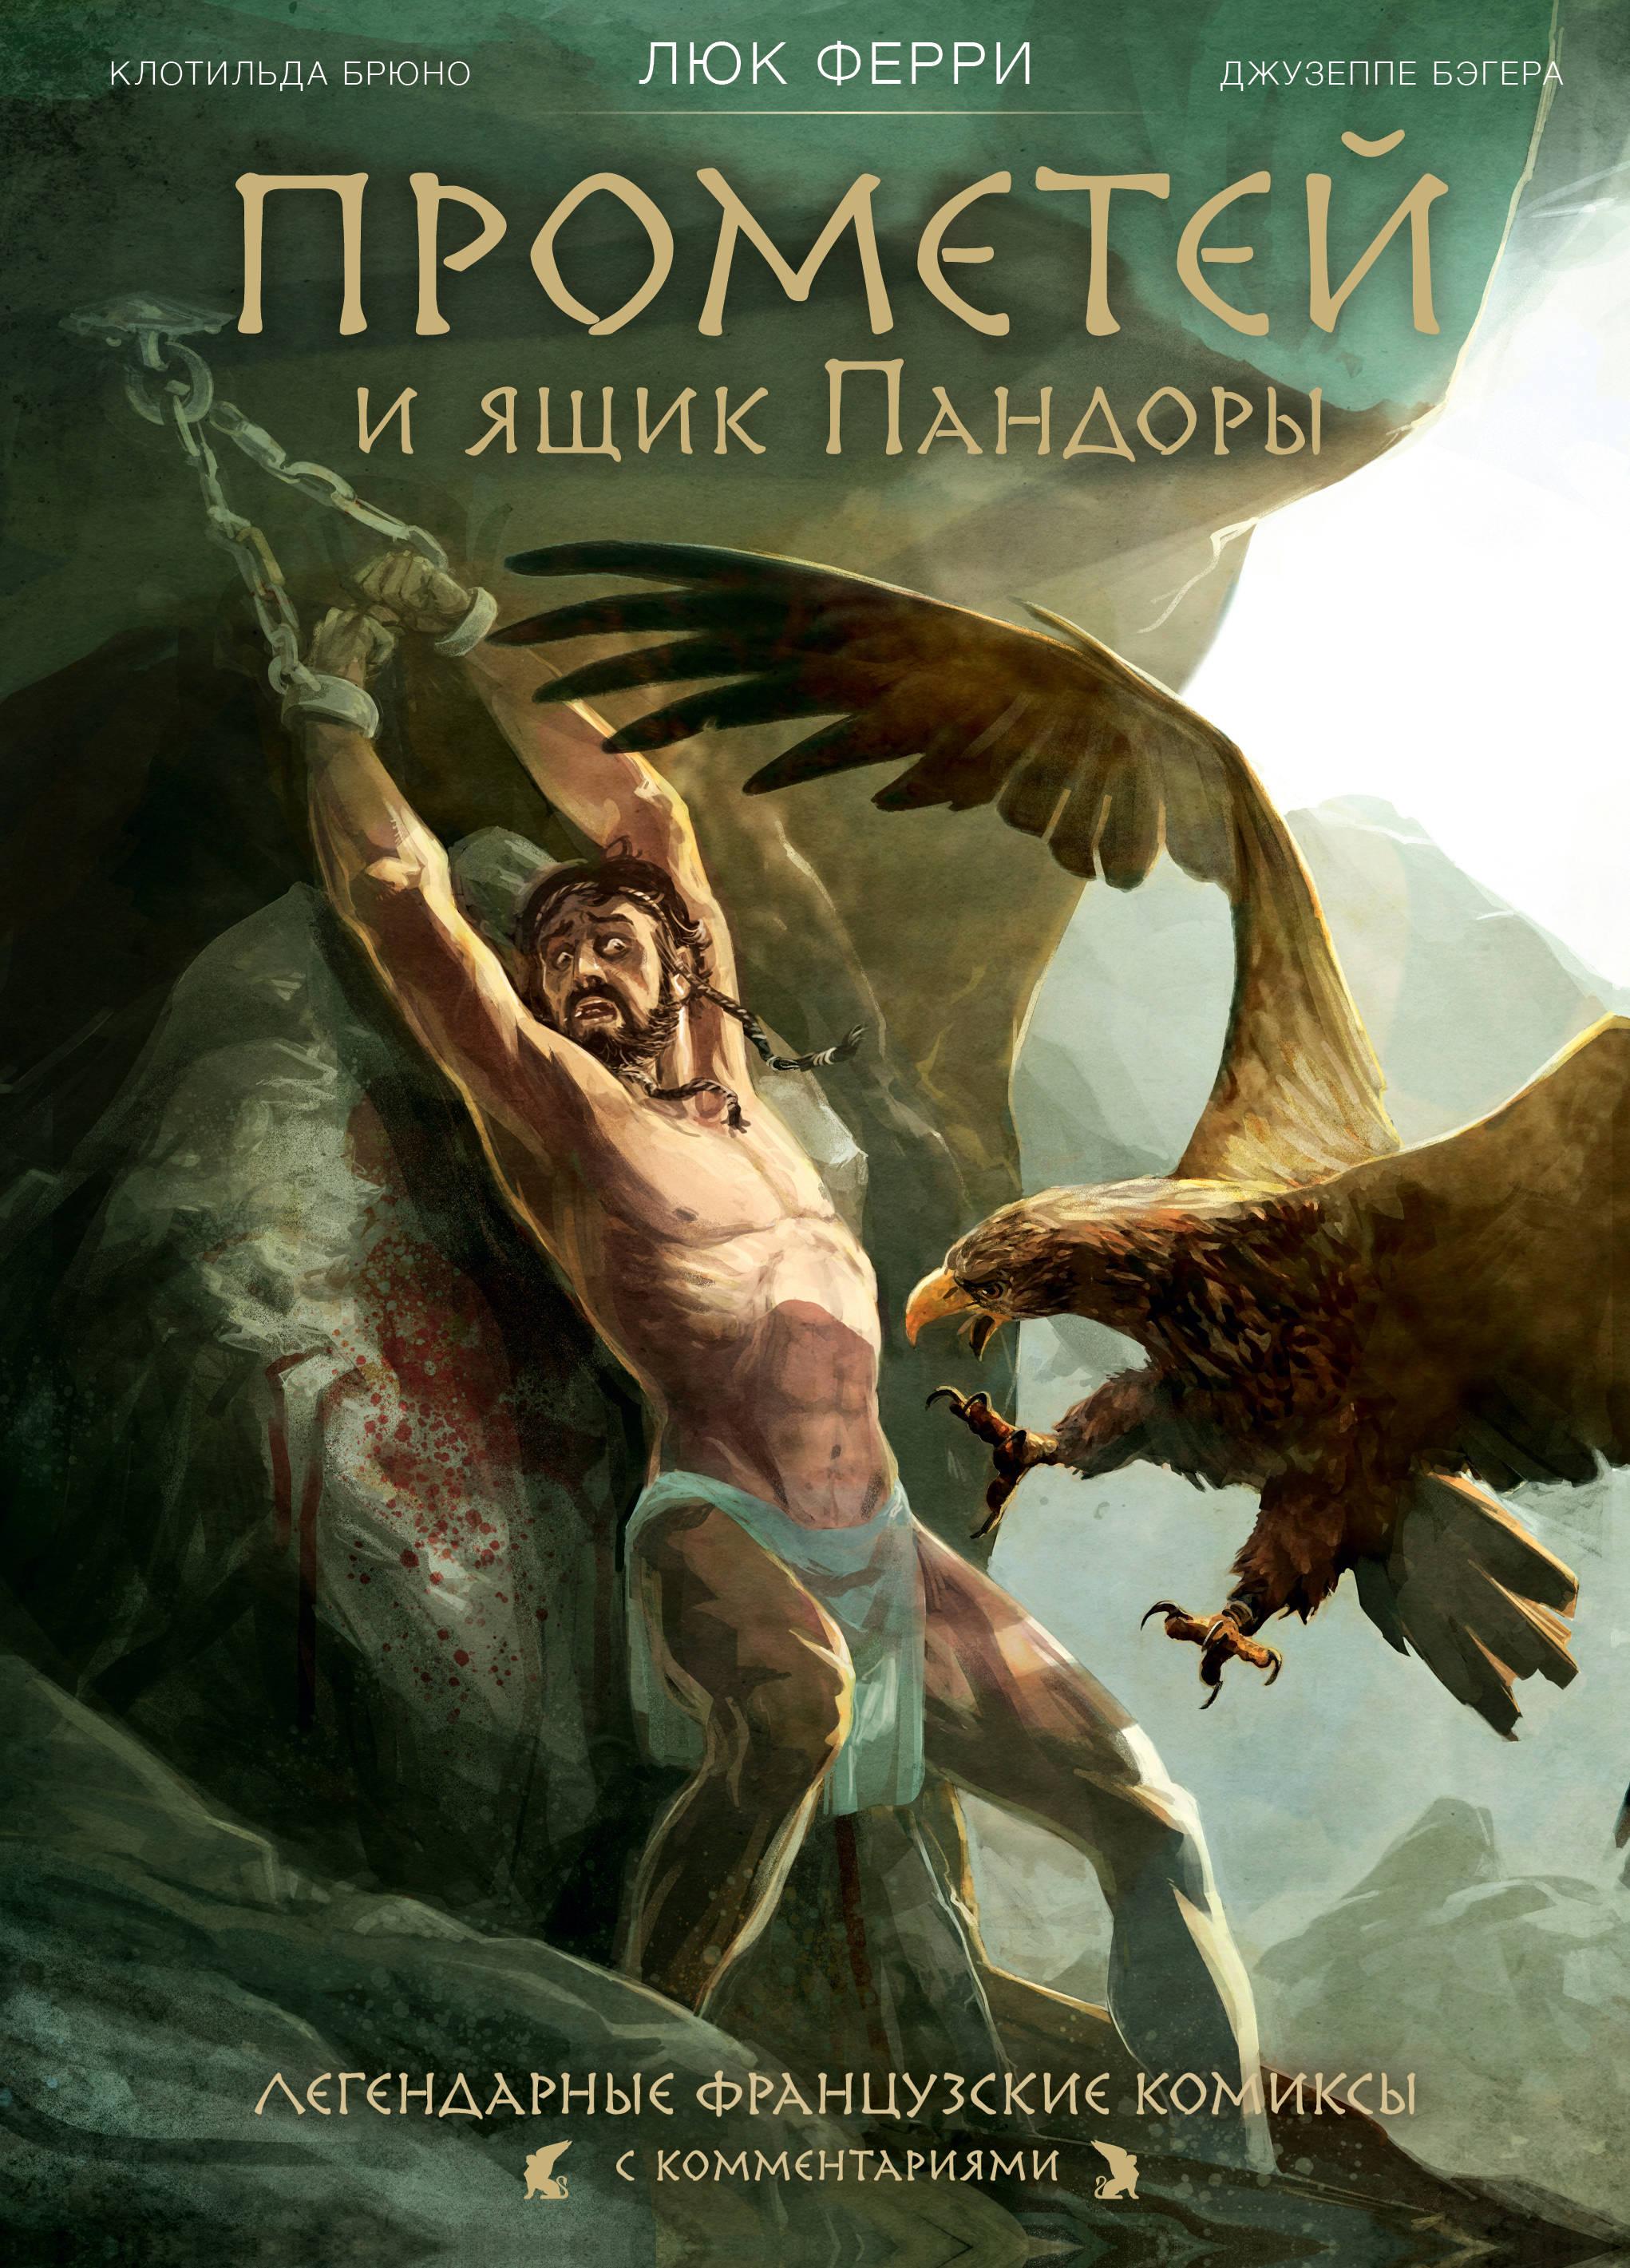 Prometej i jaschik Pandory: komiksy